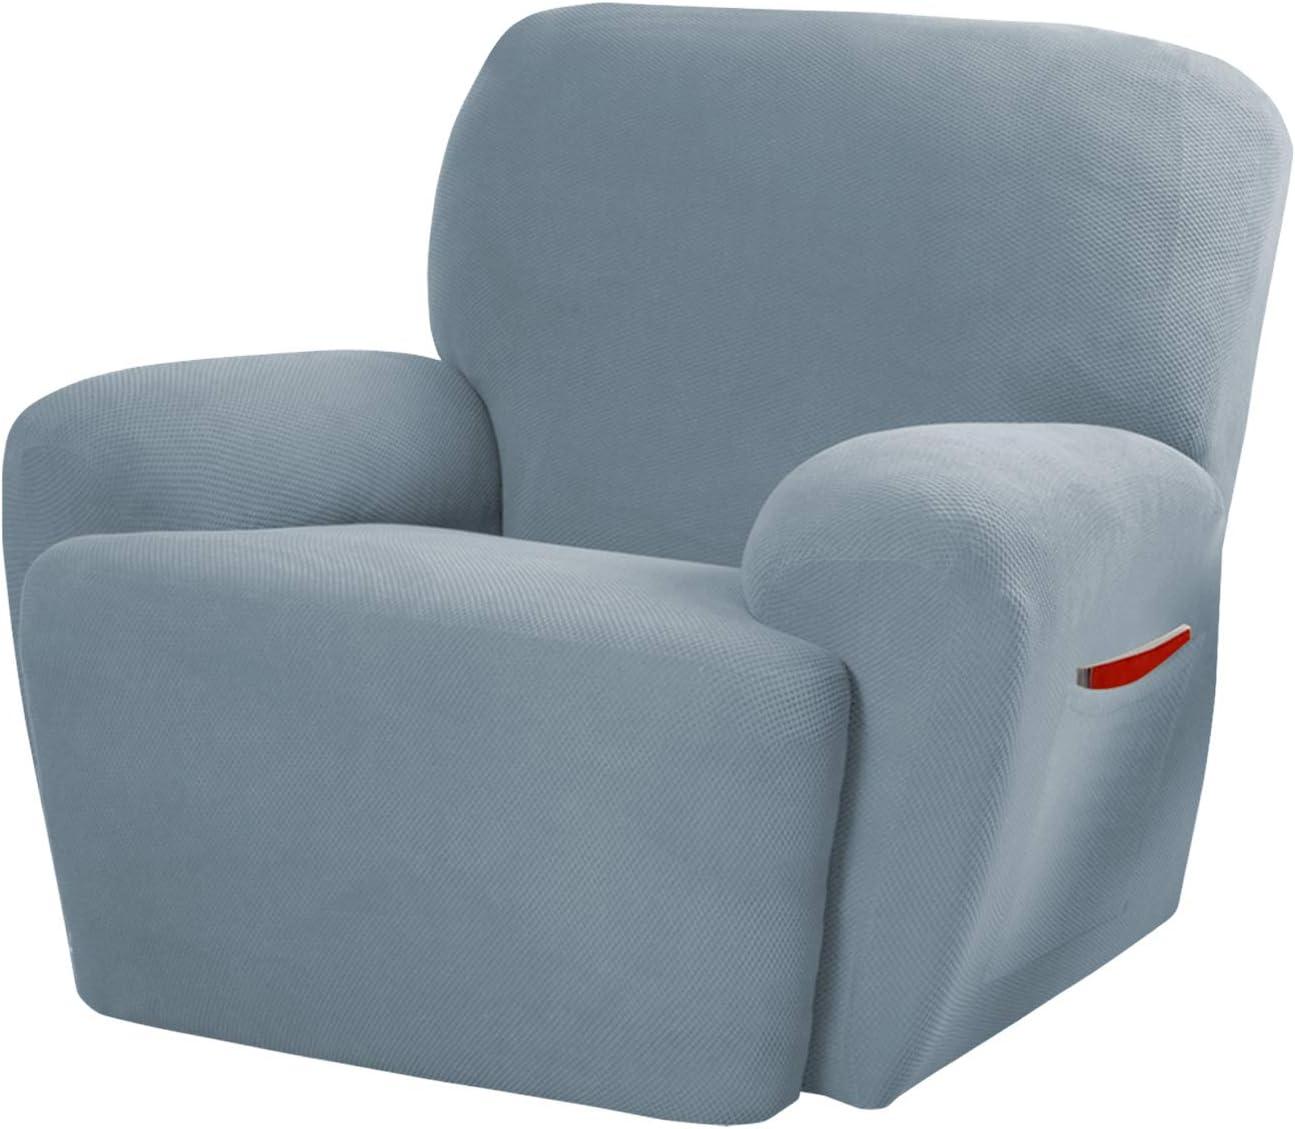 MAYTEX Pixel, Recliner, Steel Blue Chair Slipcover